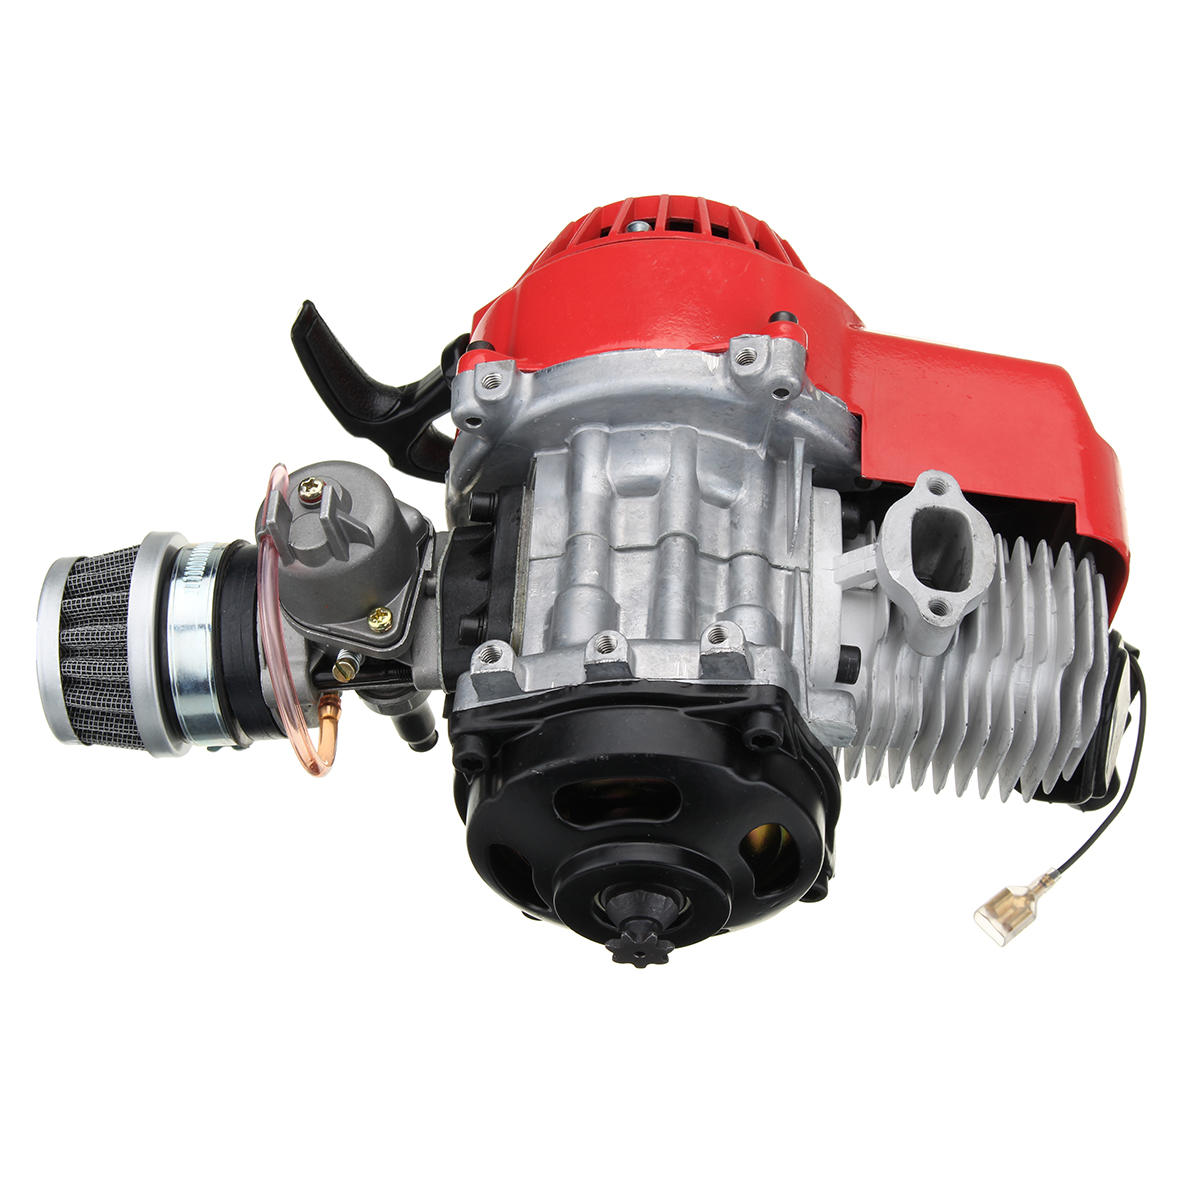 Engine 49cc 2 Stroke Motor Motorbike Mini Dirt Pocket Bike Atv Quad